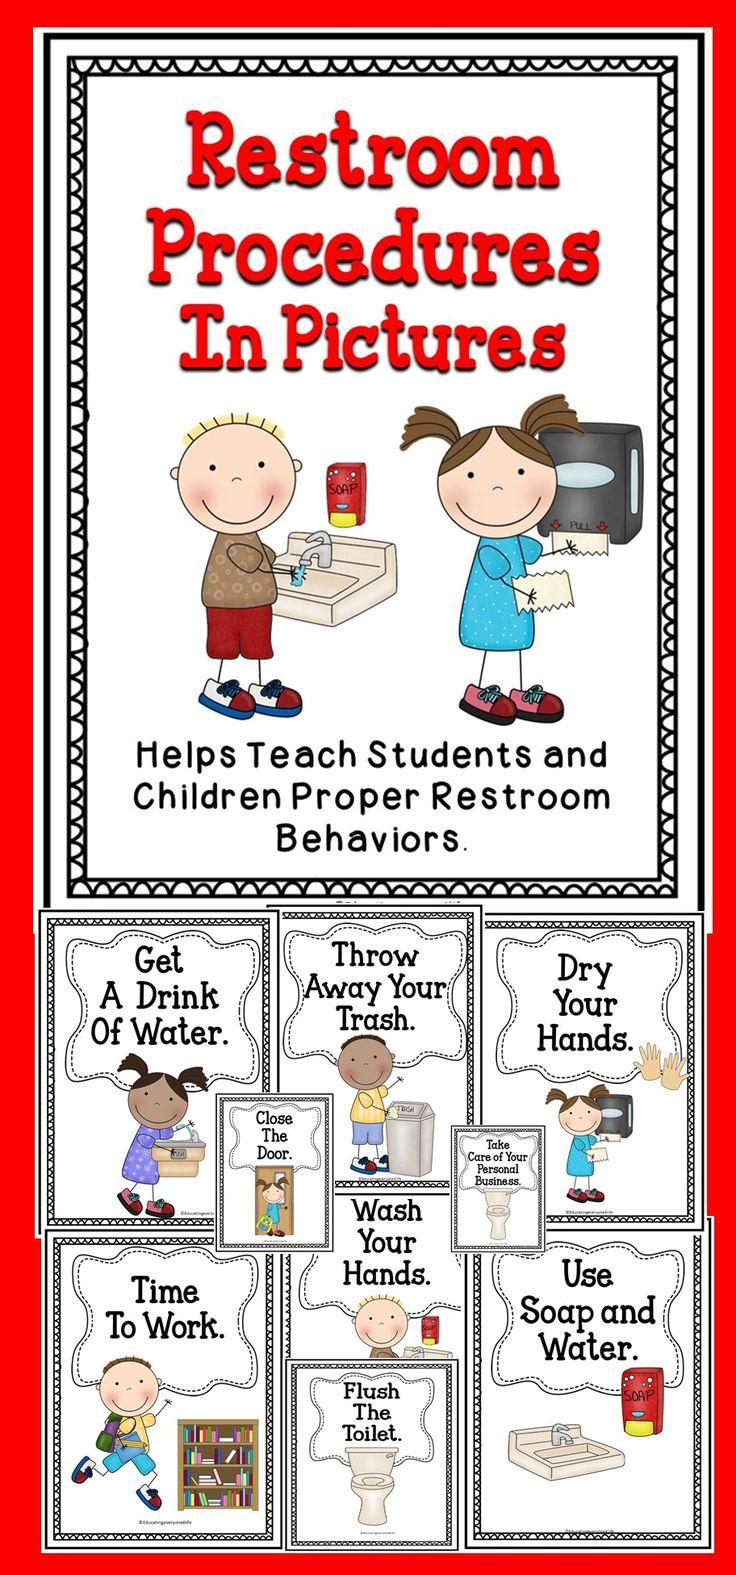 1000 ideas about teaching procedures on pinterest - Bathroom procedures for preschool ...